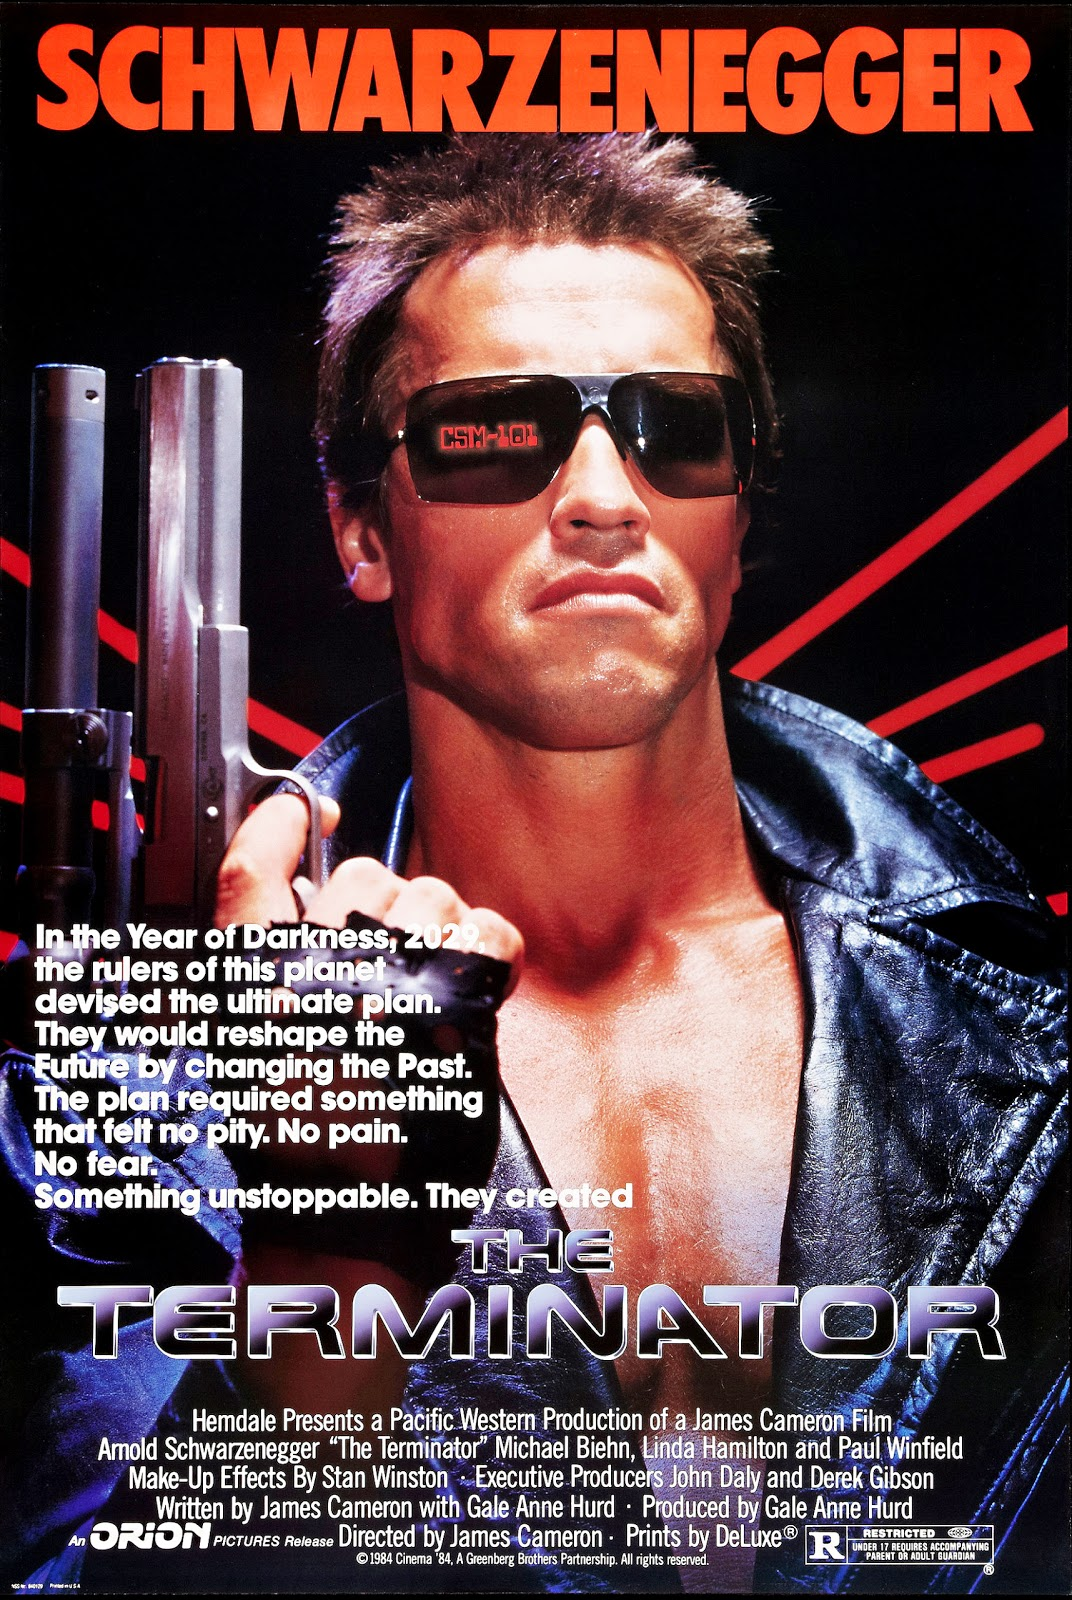 http://1.bp.blogspot.com/-W0Si_zHkUMo/UEj-LAir4nI/AAAAAAAANlo/P2o6OLb-5-M/s1600/The+Terminator+(1984)+0.jpg